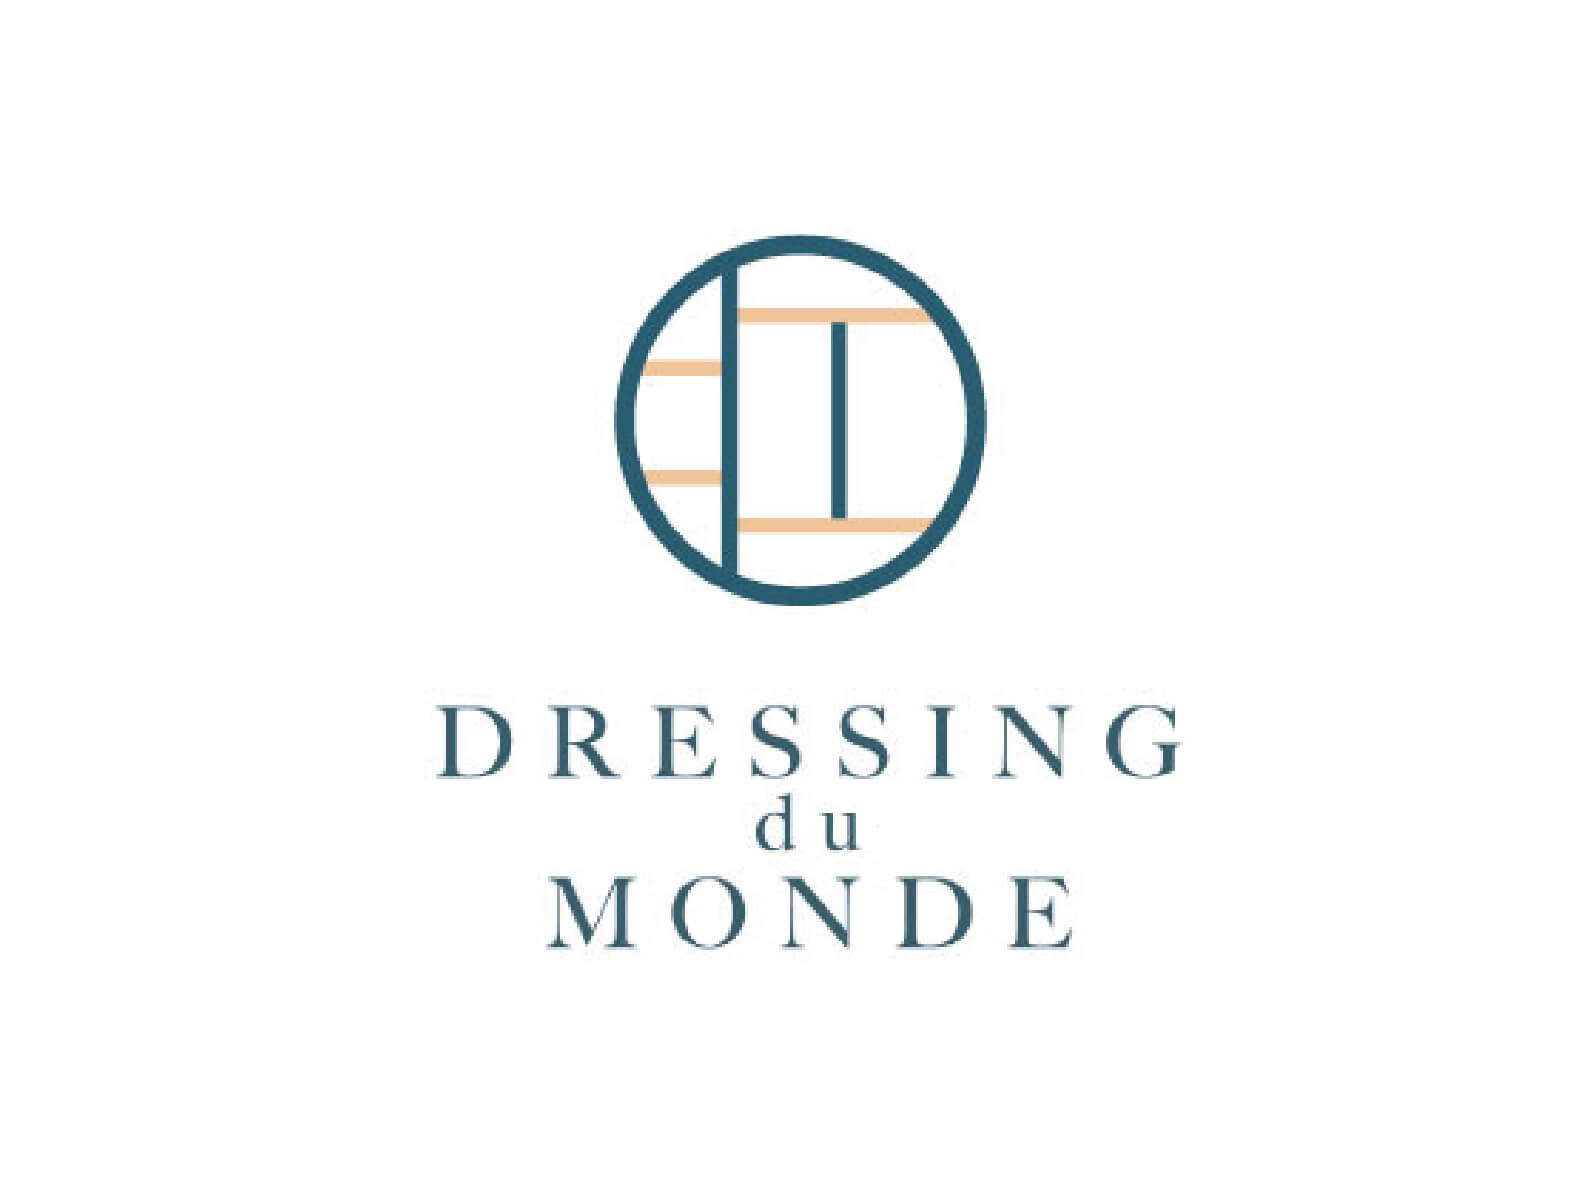 agence kayak communication web lille nord dressing du monde logo